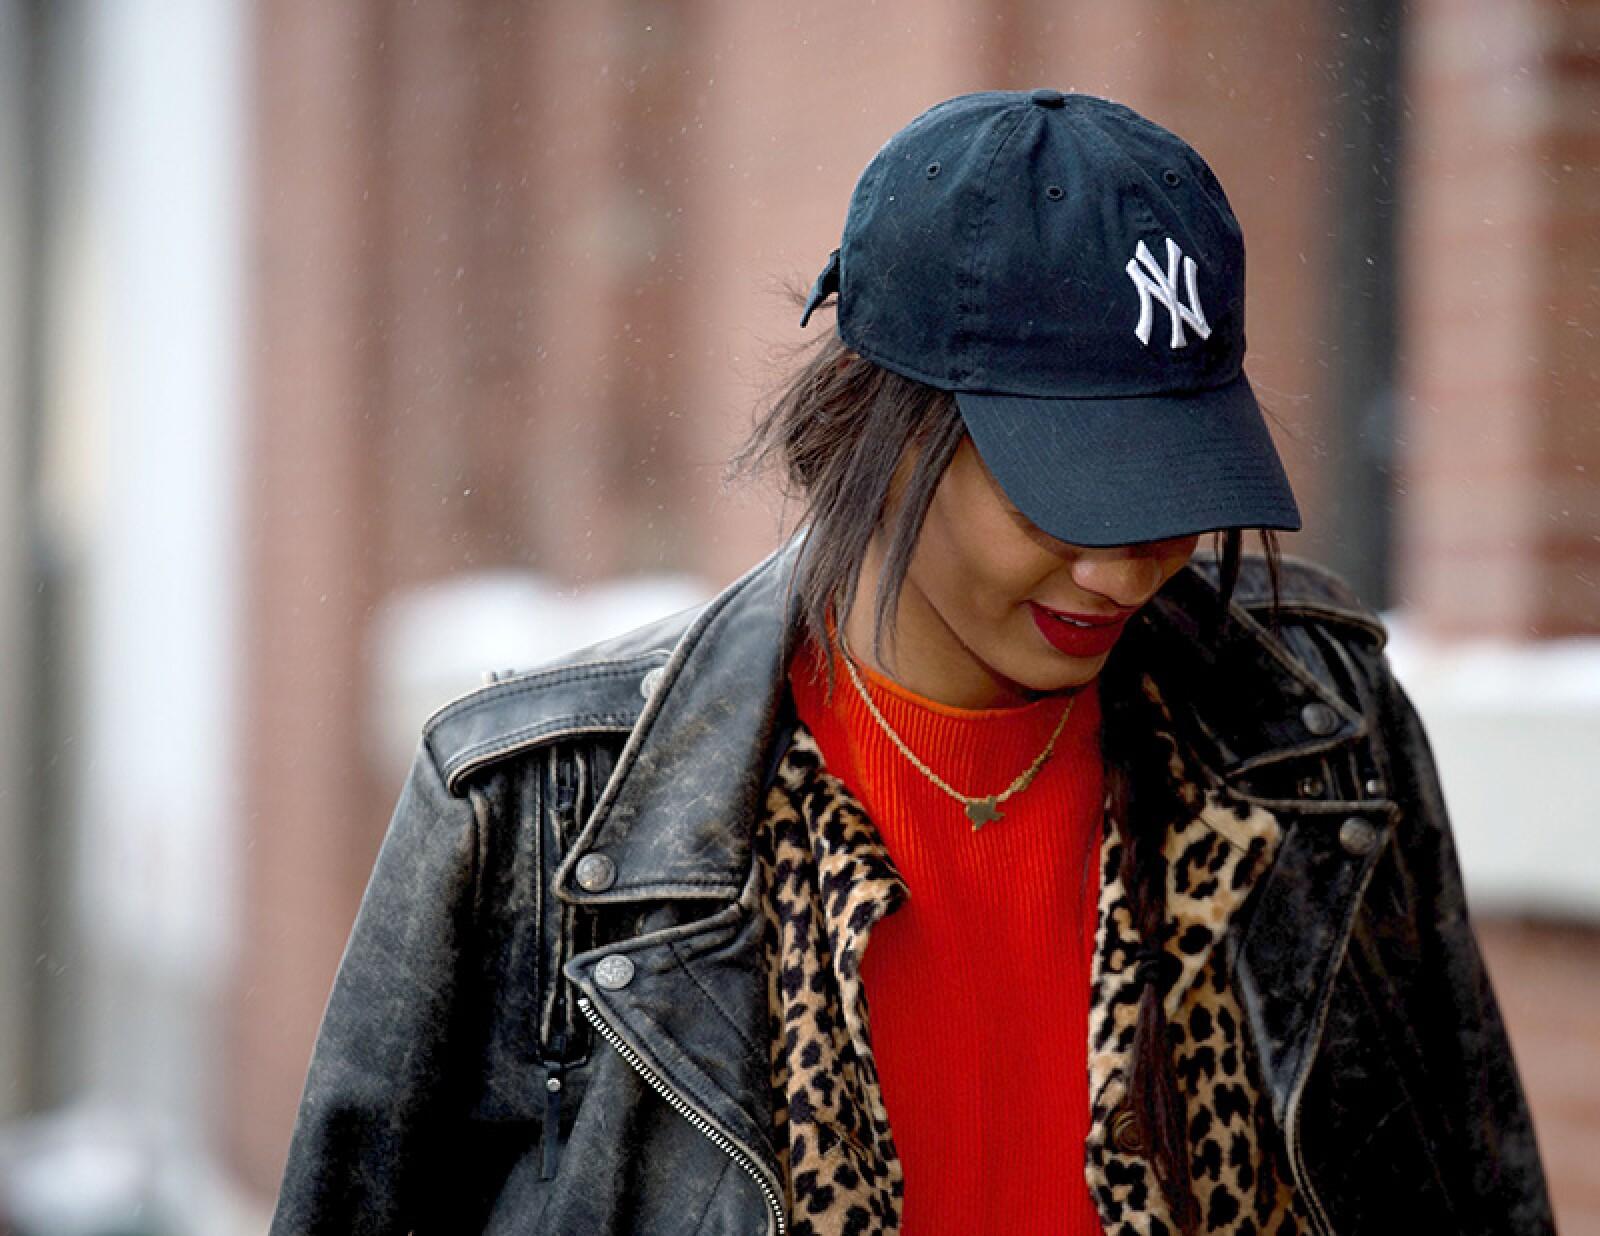 Street Style, Day 1, Fall Winter 2017, New York Fashion Week, USA - 09 Feb 2017